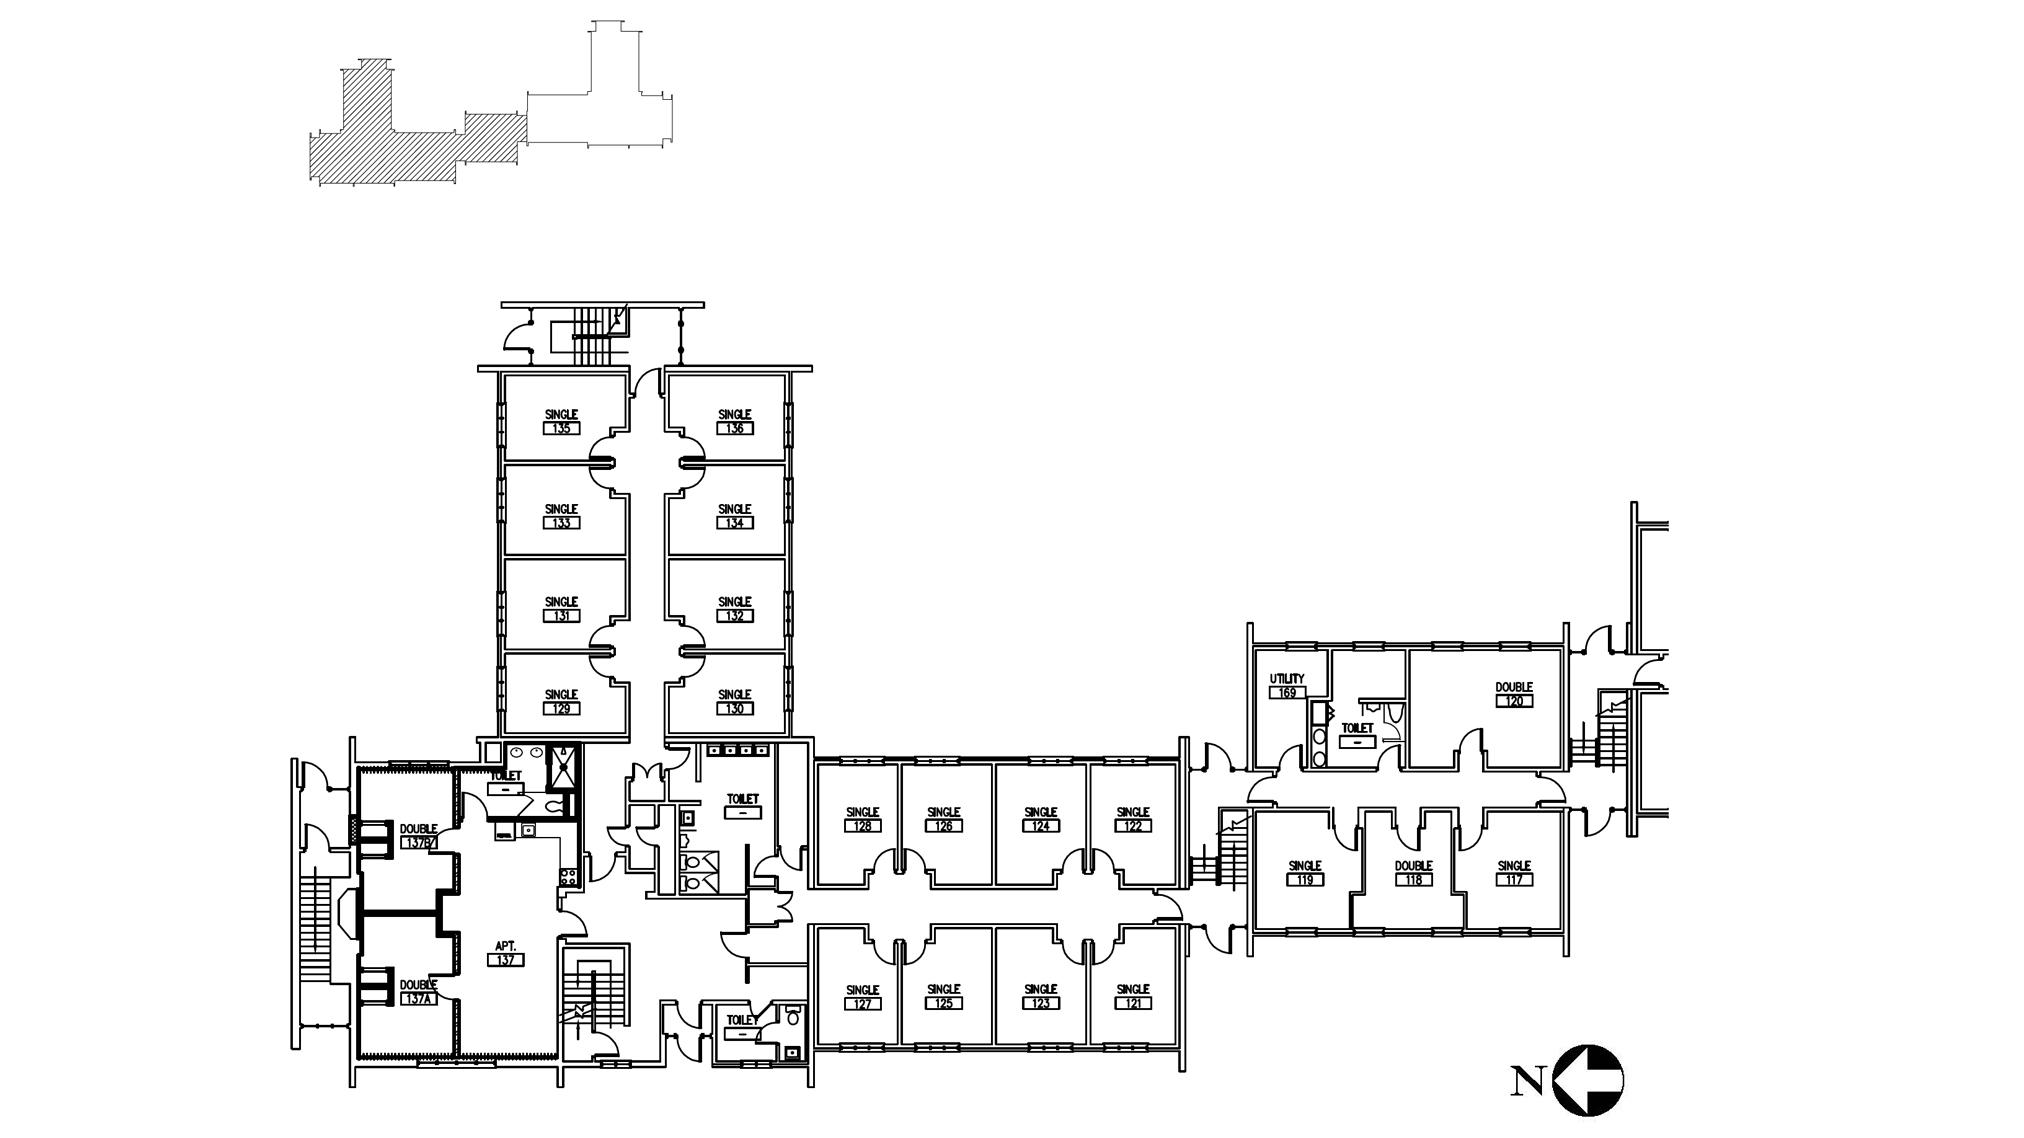 Bundy Campus Map.Bundy